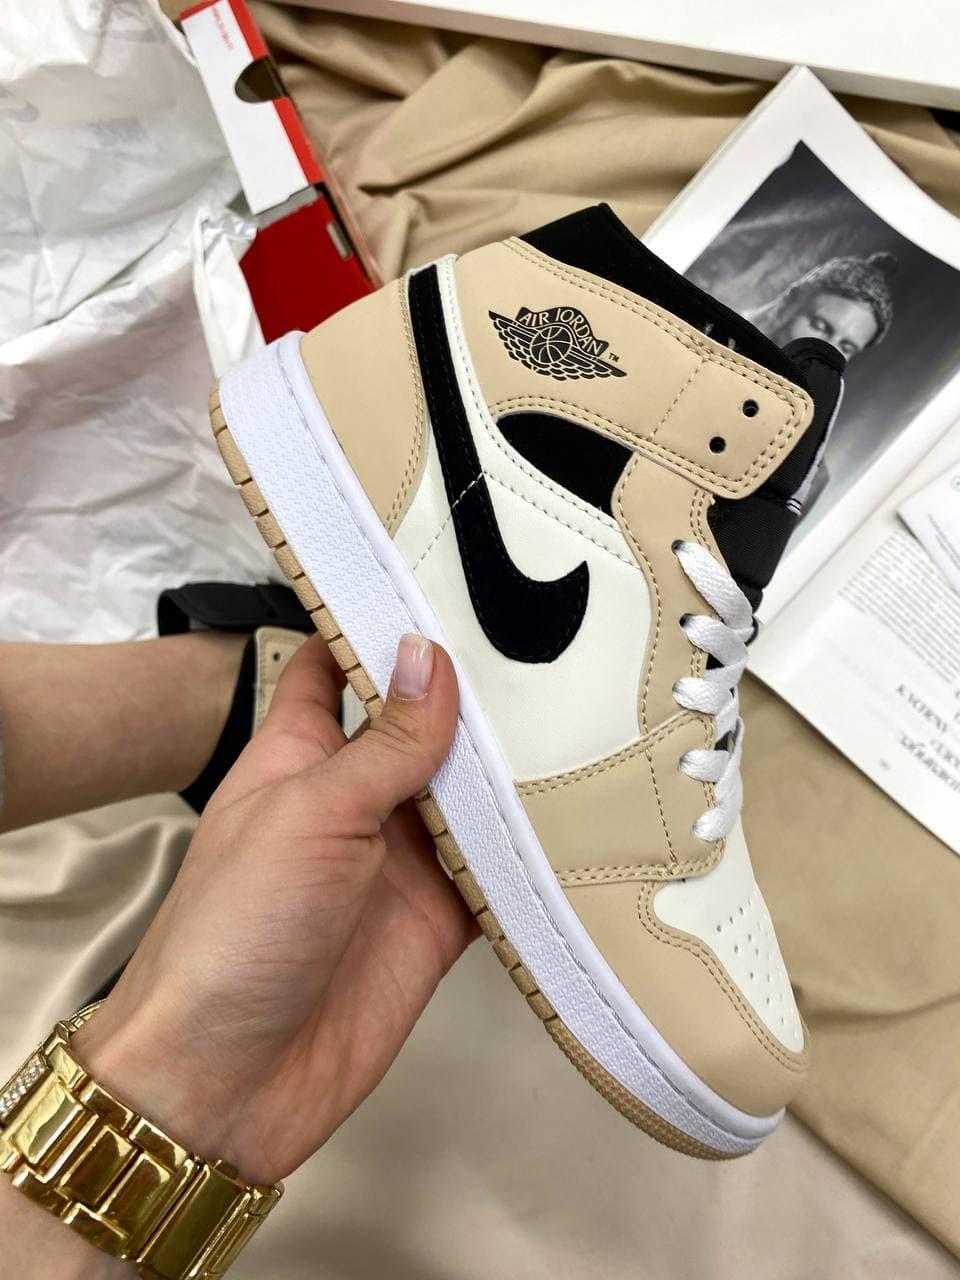 Жіночі кросівки Nike Air Jordan Retro High Beige/Black